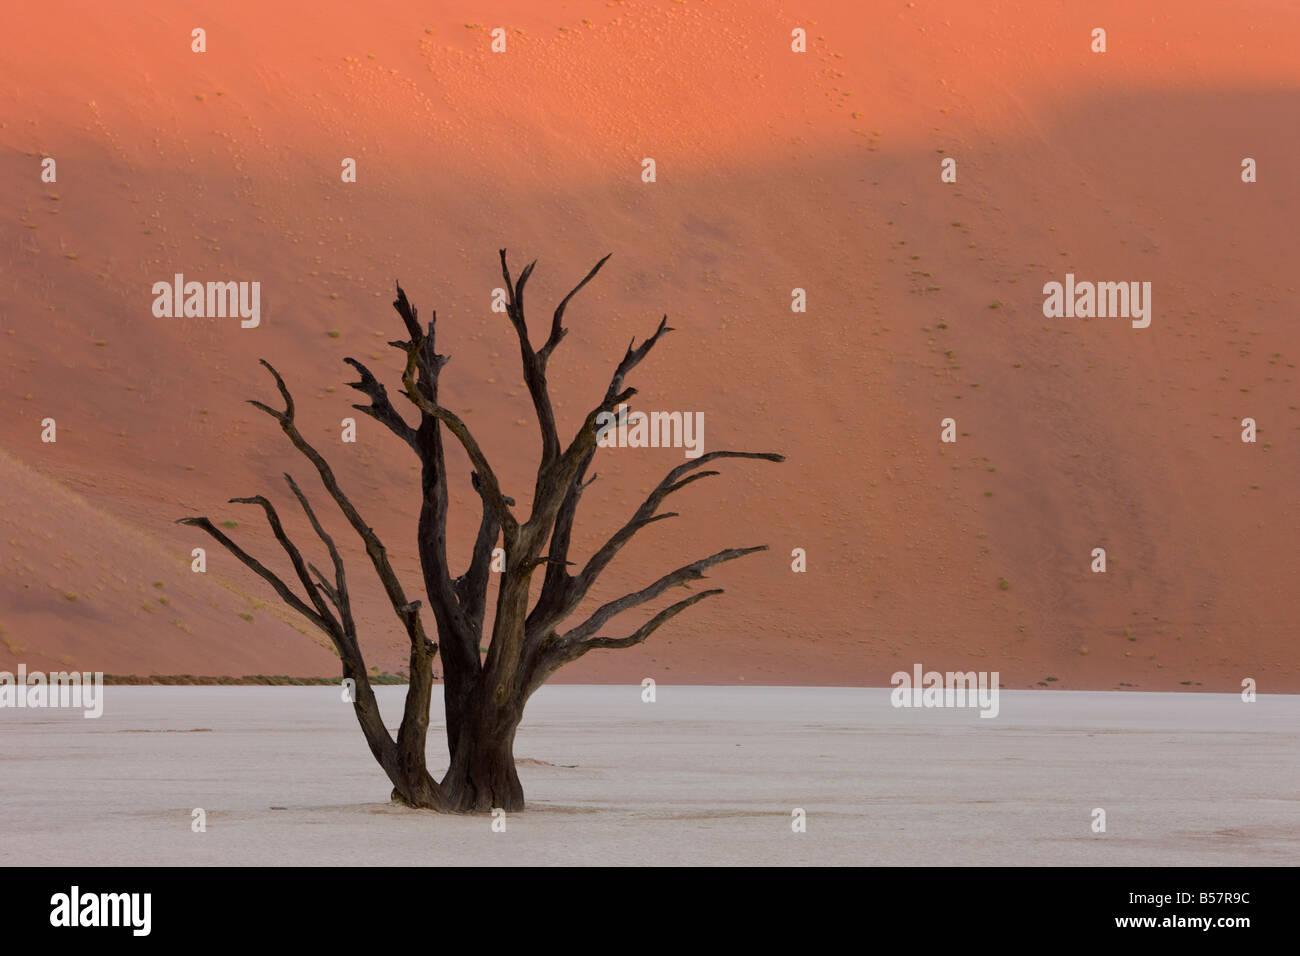 Dead Vlei, Sossusvlei, Désert du Namib, Namibie, Afrique Photo Stock